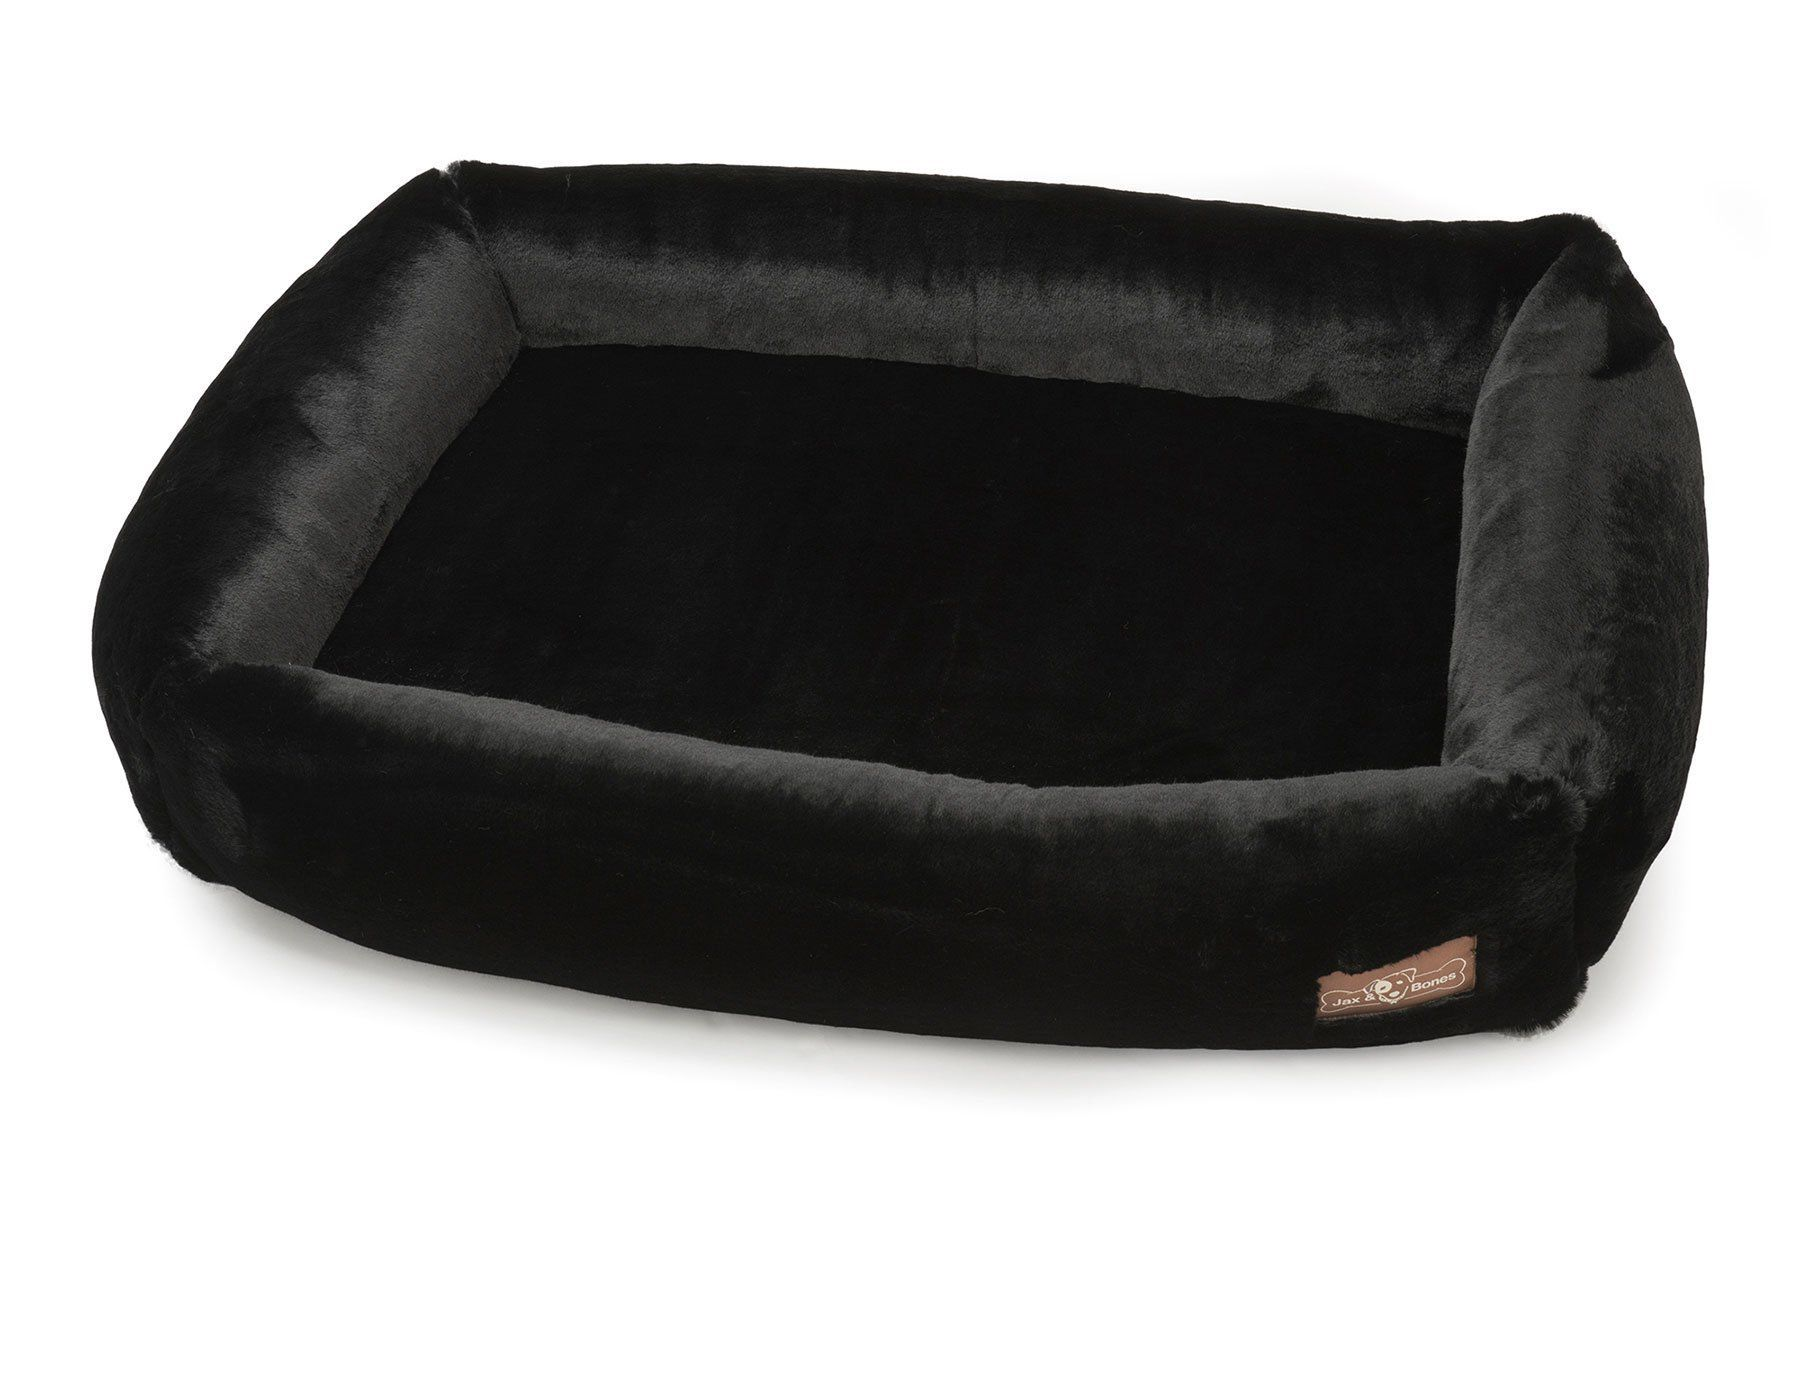 Mink Night Memory Foam Cuddler Pet Bed In 2021 Memory Foam Handmade Bed Dog Bed